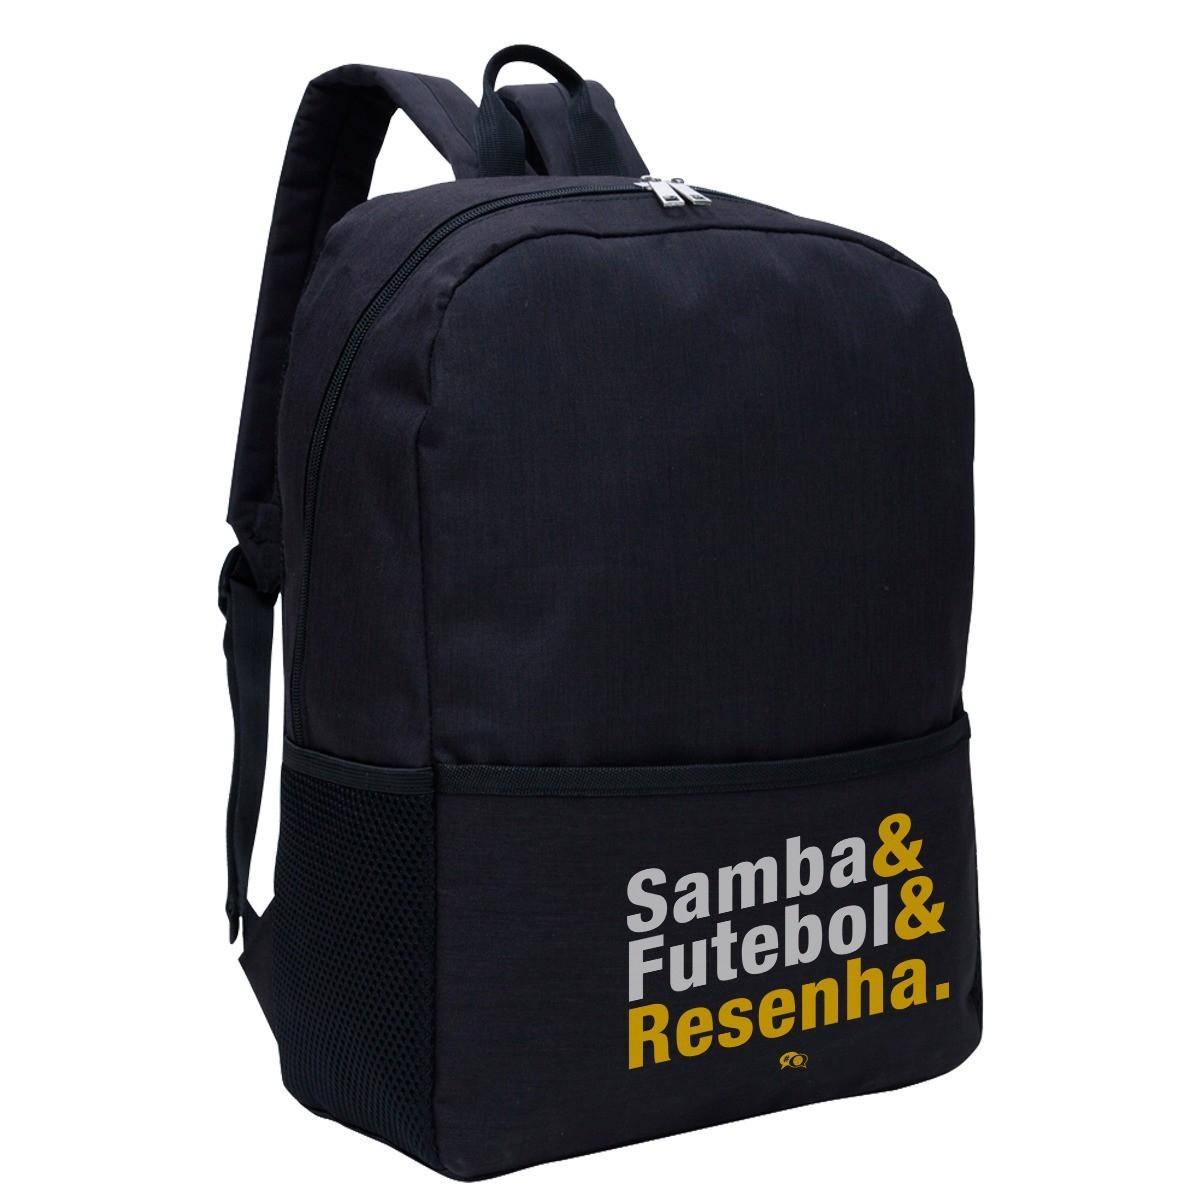 Mochila - Samba, Resenha e Futebol